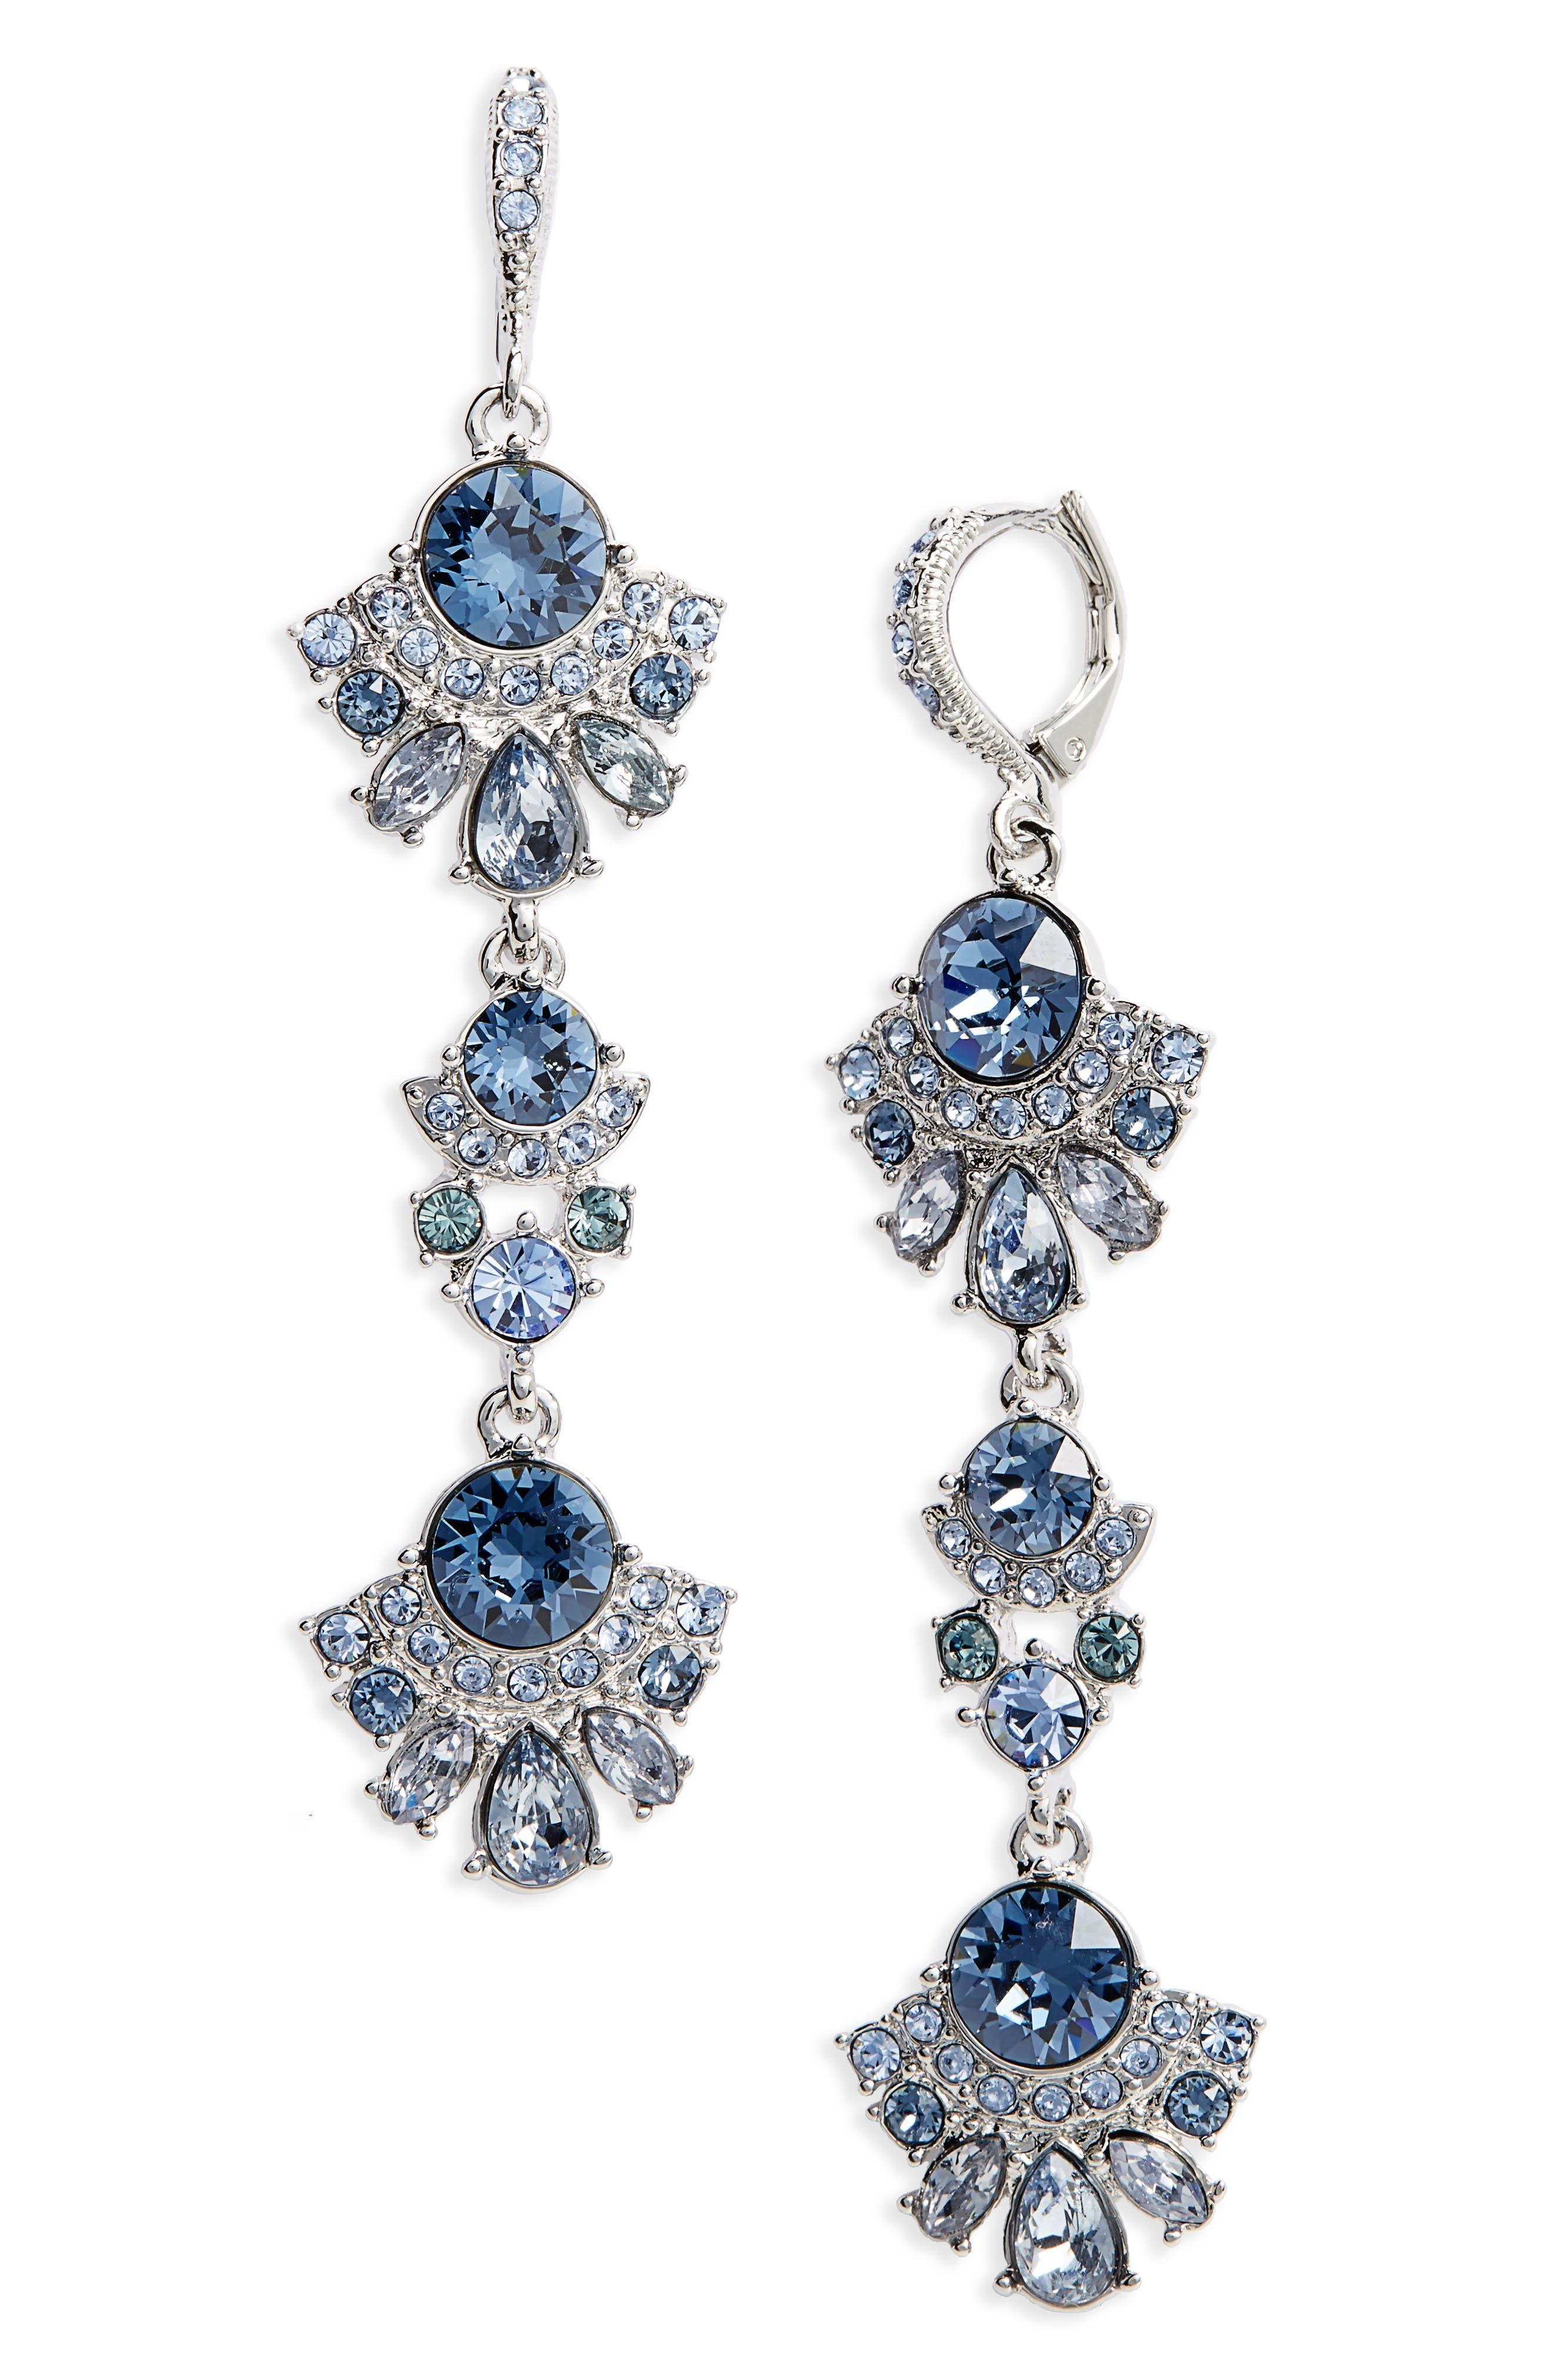 Main Image - Givenchy Verona Linear Earrings